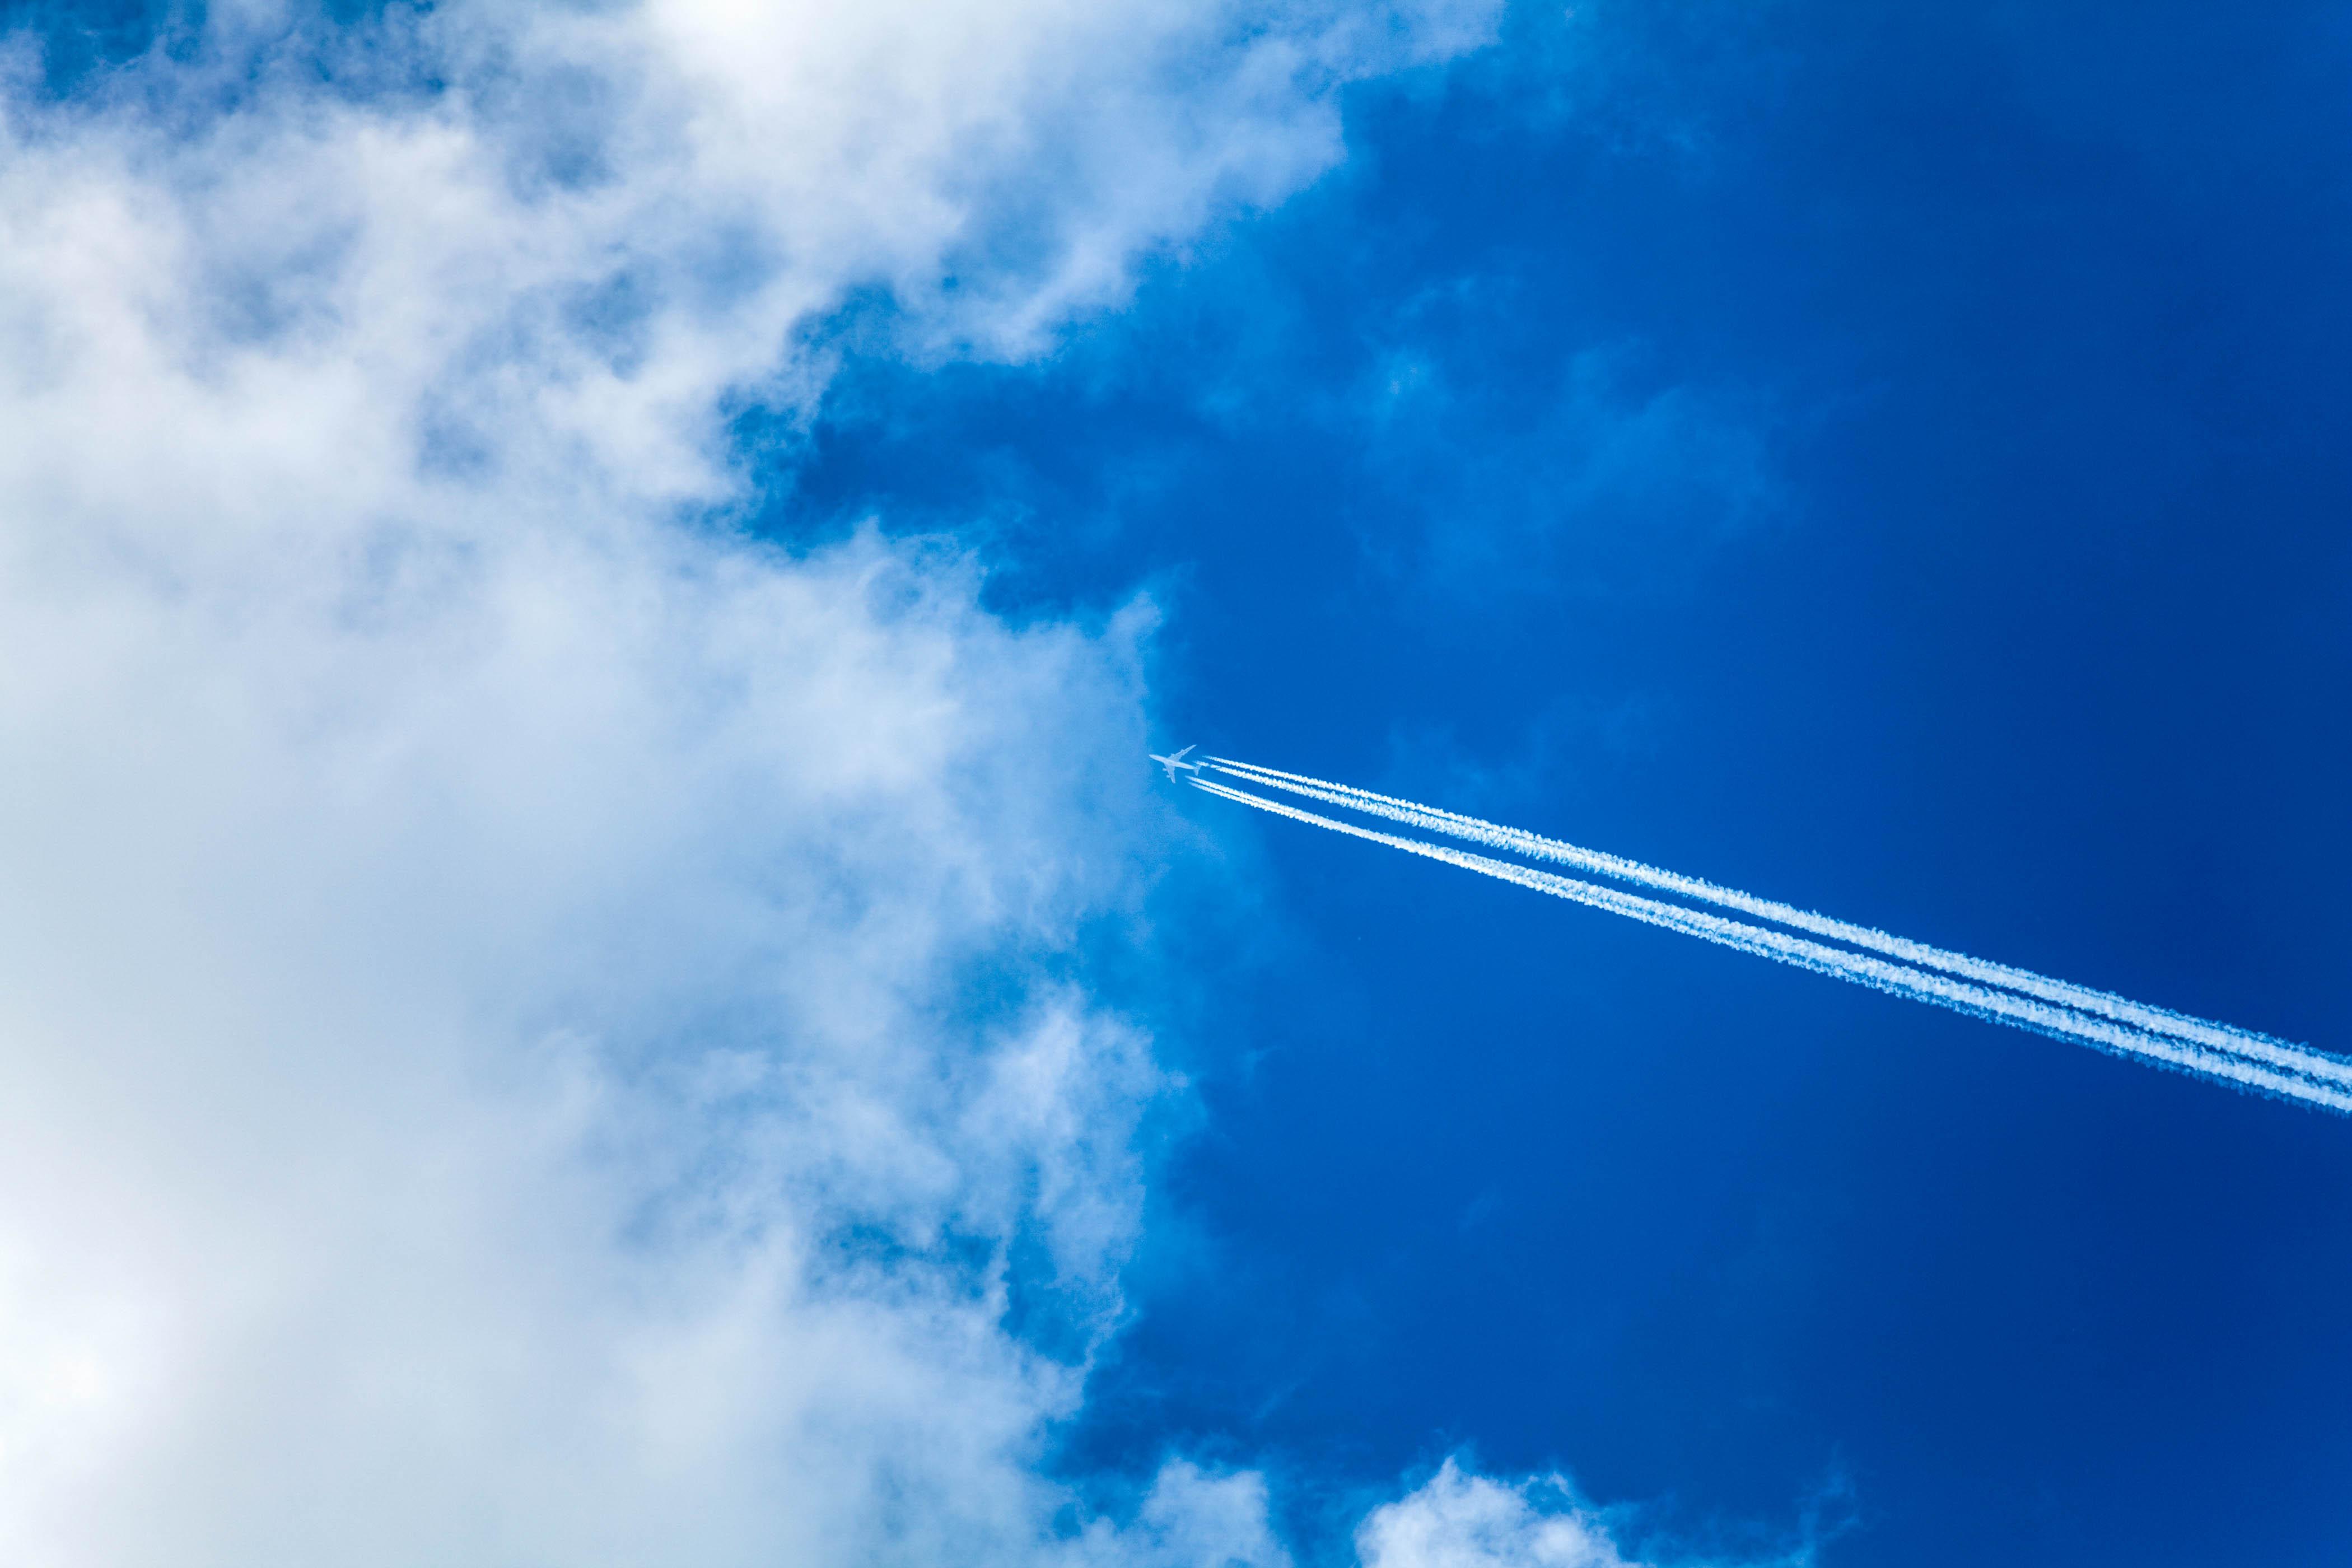 Flugzeug am Himmel, Chemtrail Theorie